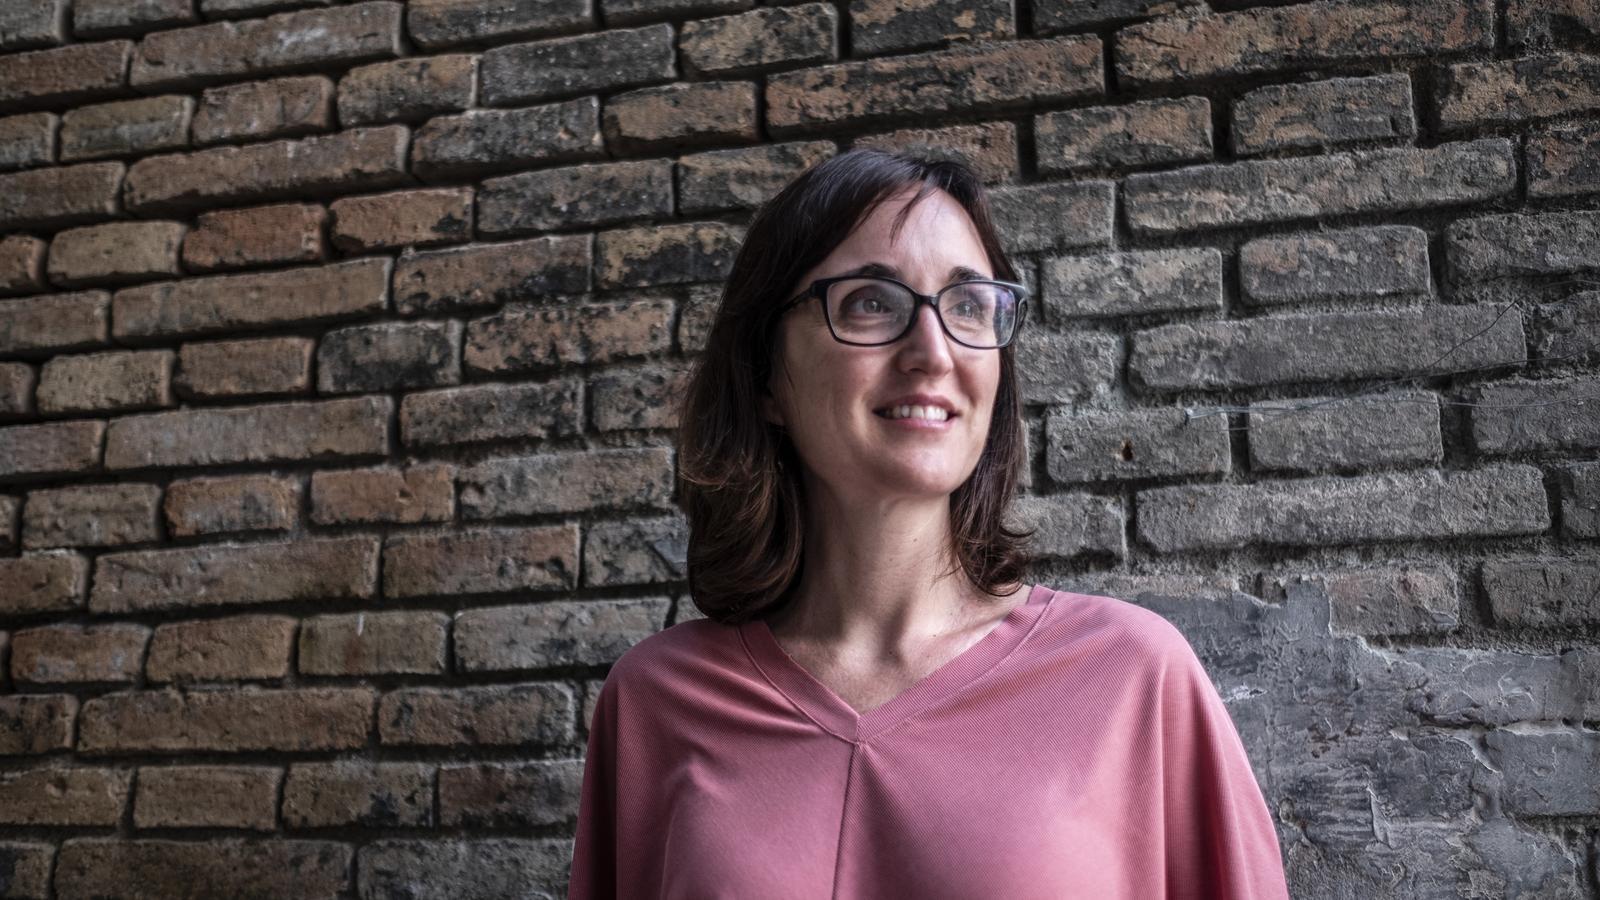 La periodista de l'ARA, Tahïs Gutierrez